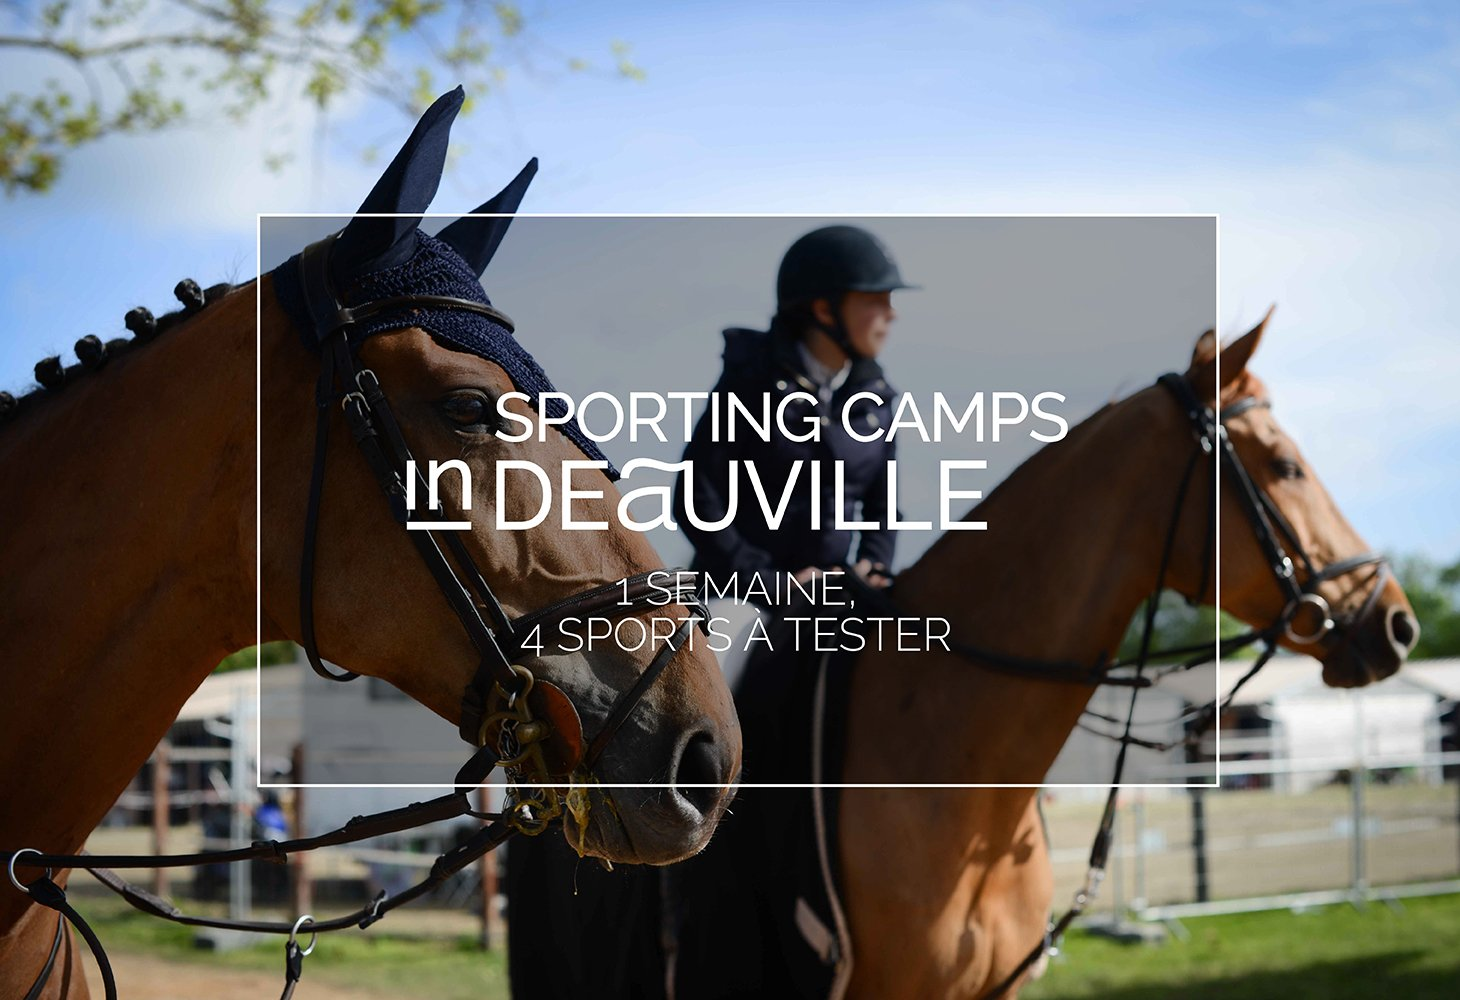 Visuelle Sportcamps in Deauville